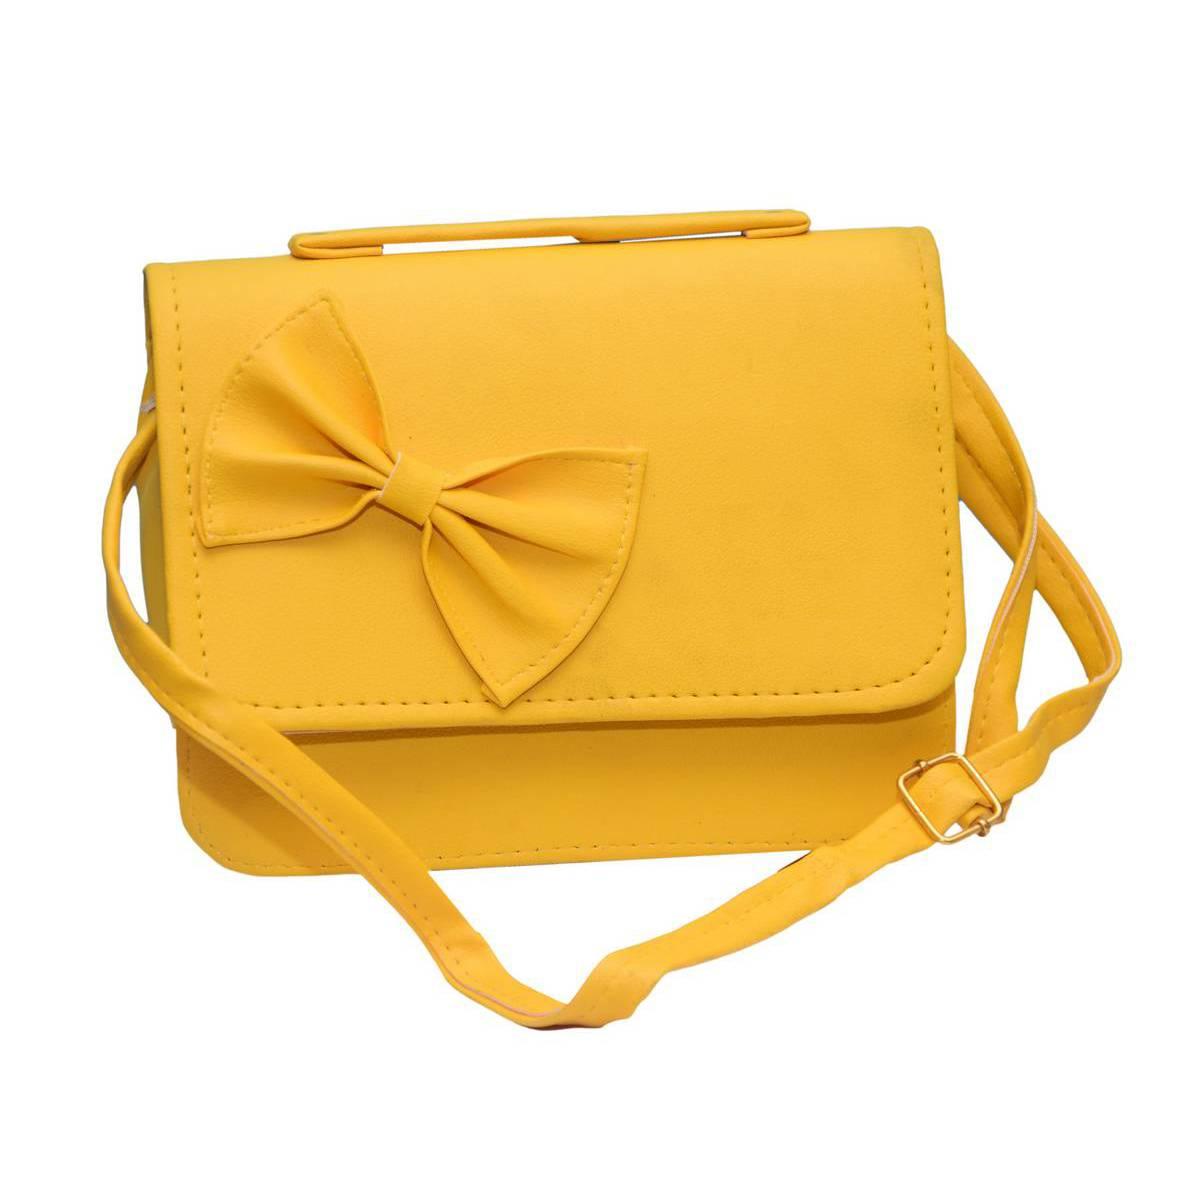 New Stylish Hand Bag Shoulder Bag Cross Body Bag For Women & Girls With Long Stap